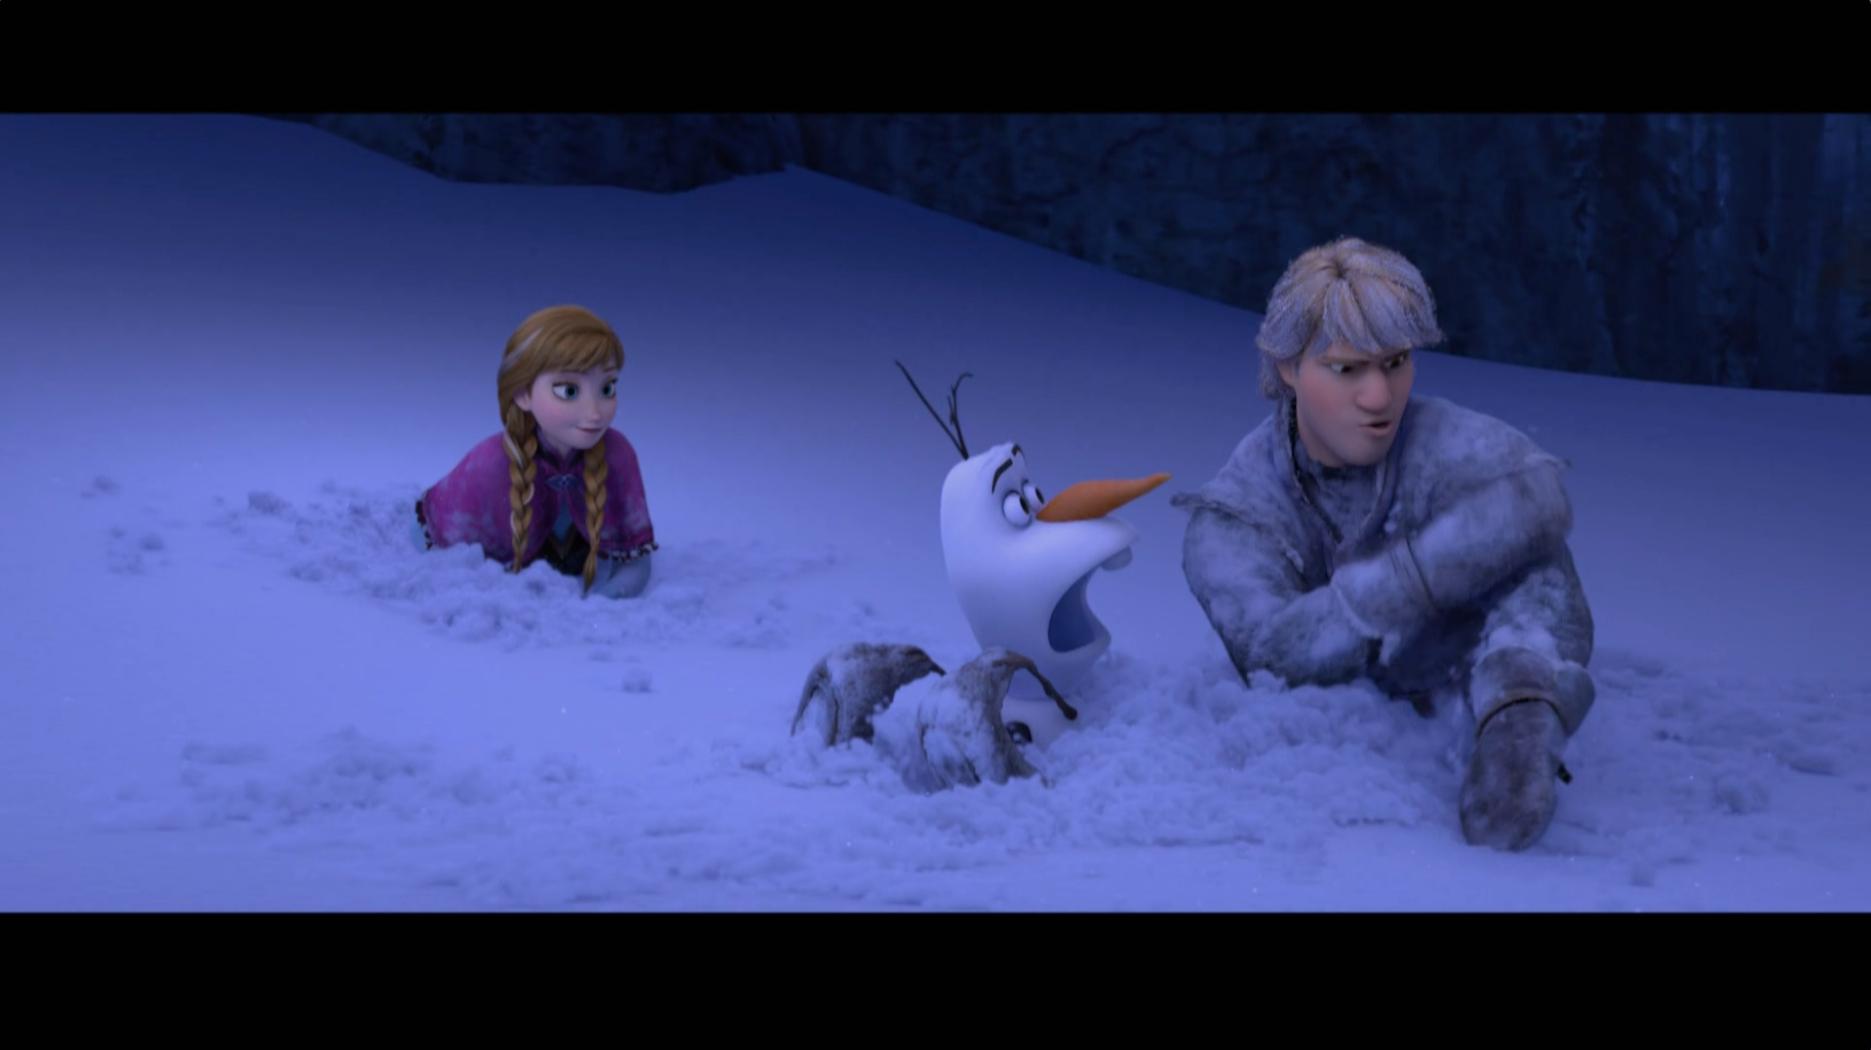 Mantendo a calma sob pressão – Olaf dá risada